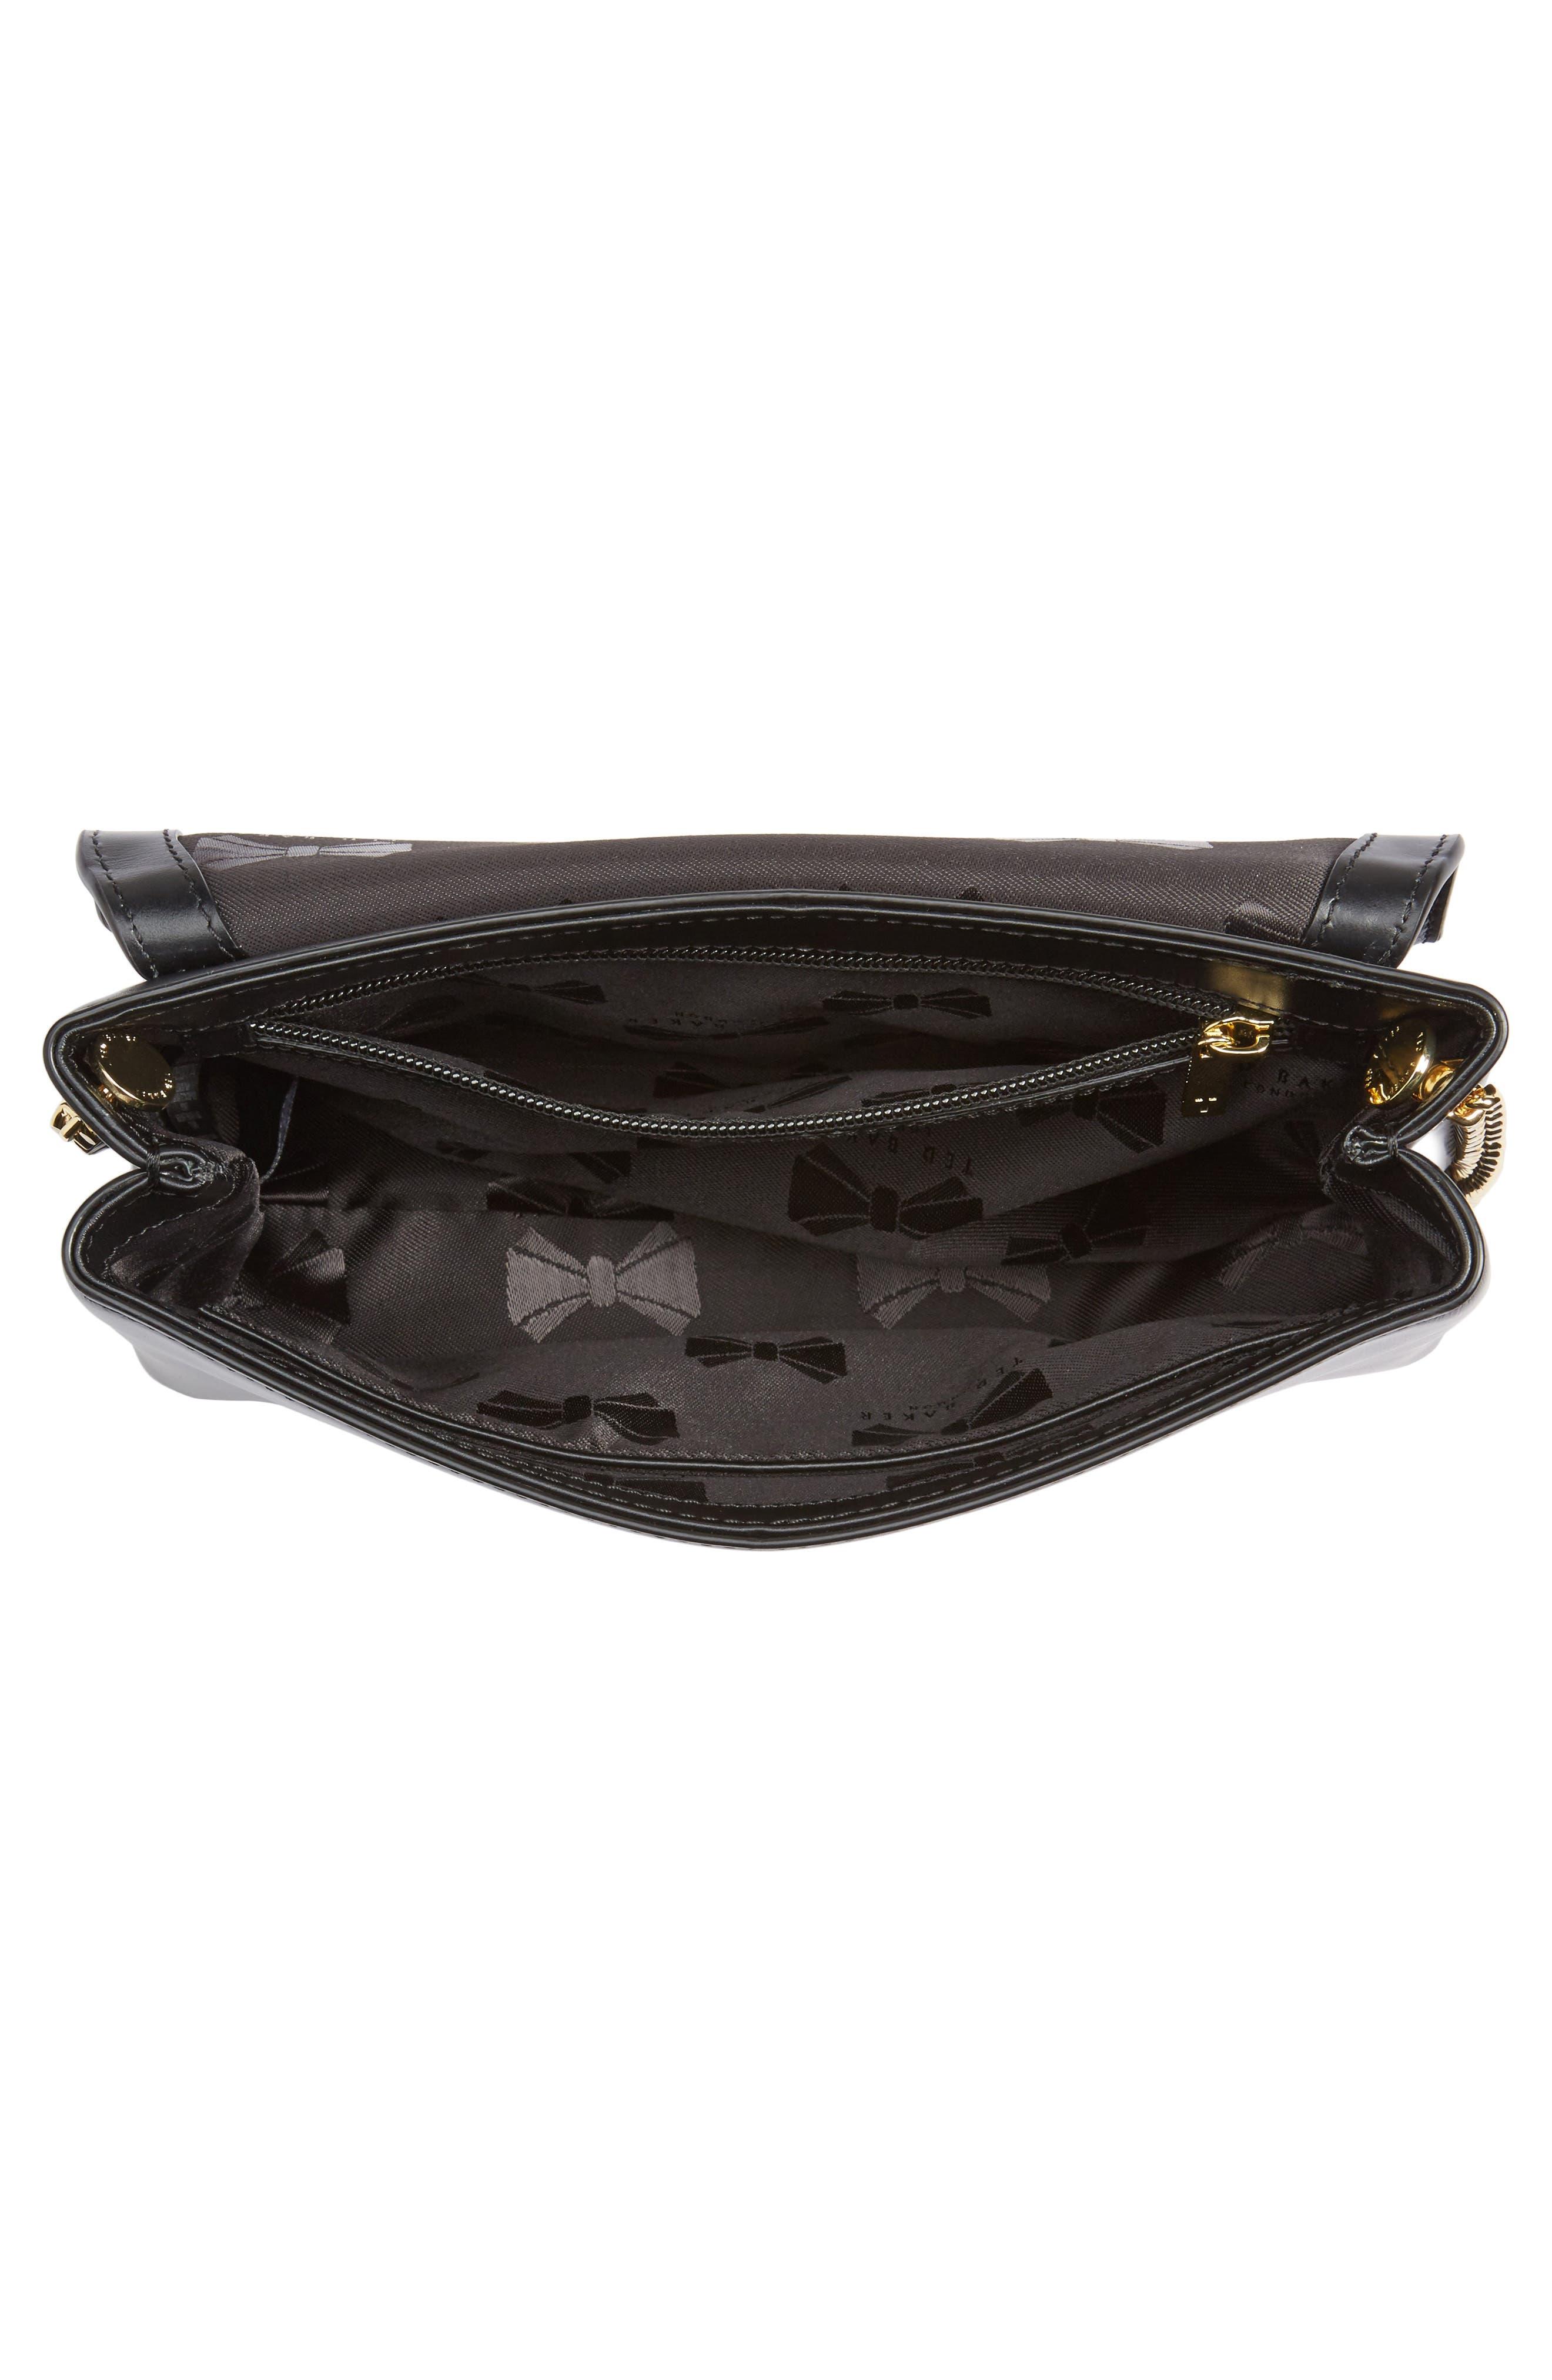 Saraa Leather Crossbody Bag,                             Alternate thumbnail 3, color,                             Black